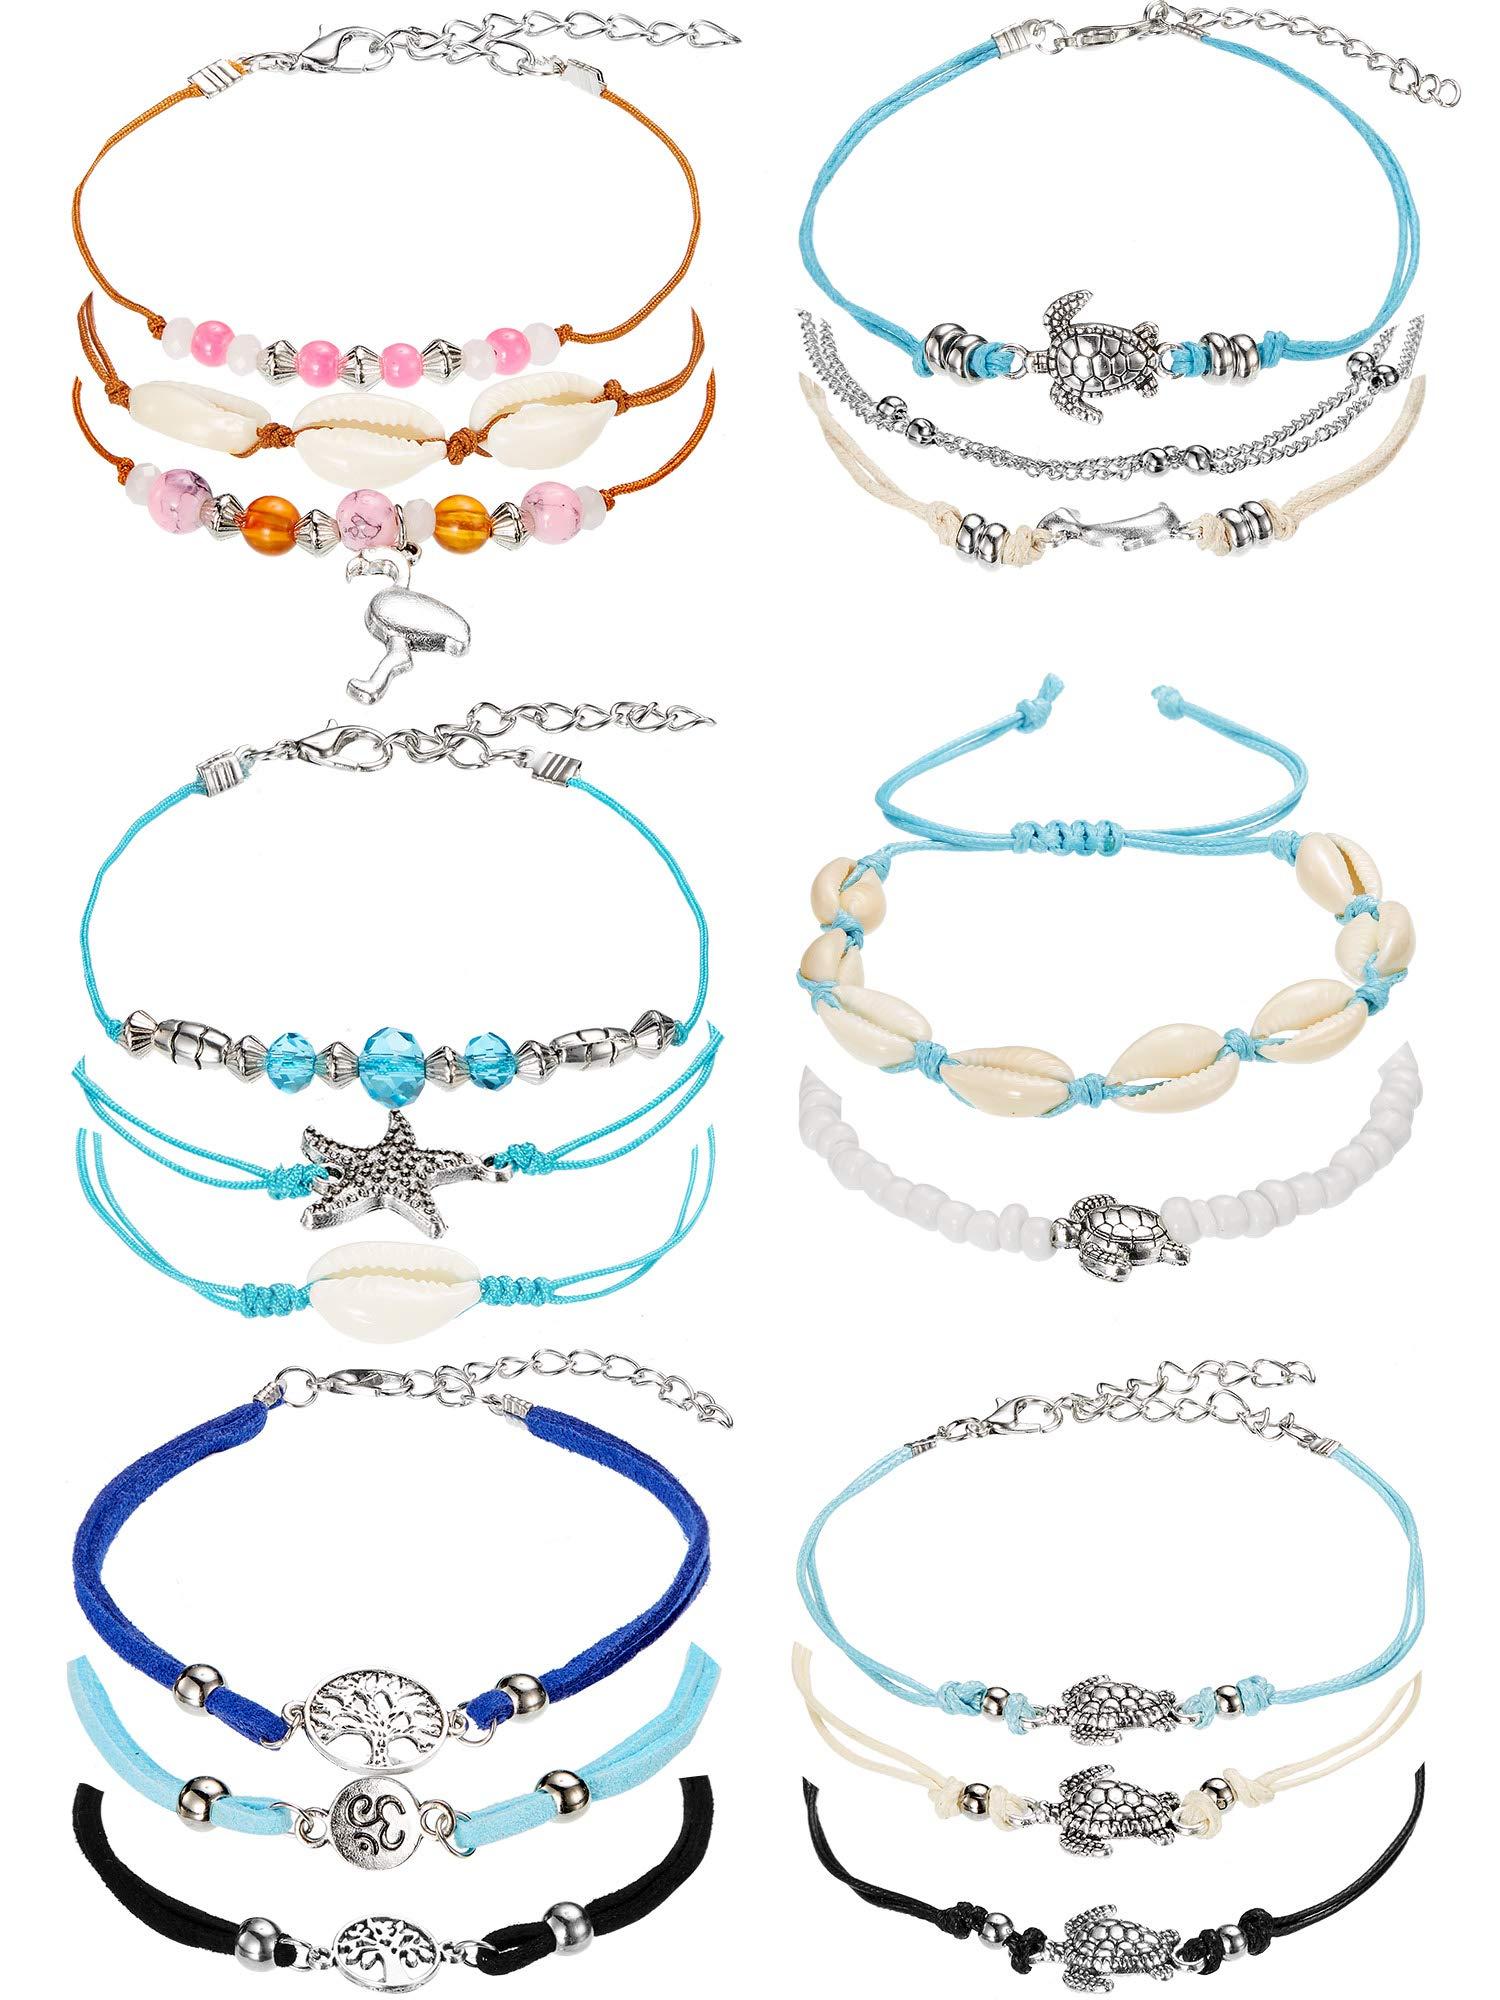 meekoo 17 Pieces Anklet Bracelets Adjustable Boho Turtle Starfish Shell Flamingo Beach Ankle Bracelets Foot Jewelry for Women (Style A) by meekoo